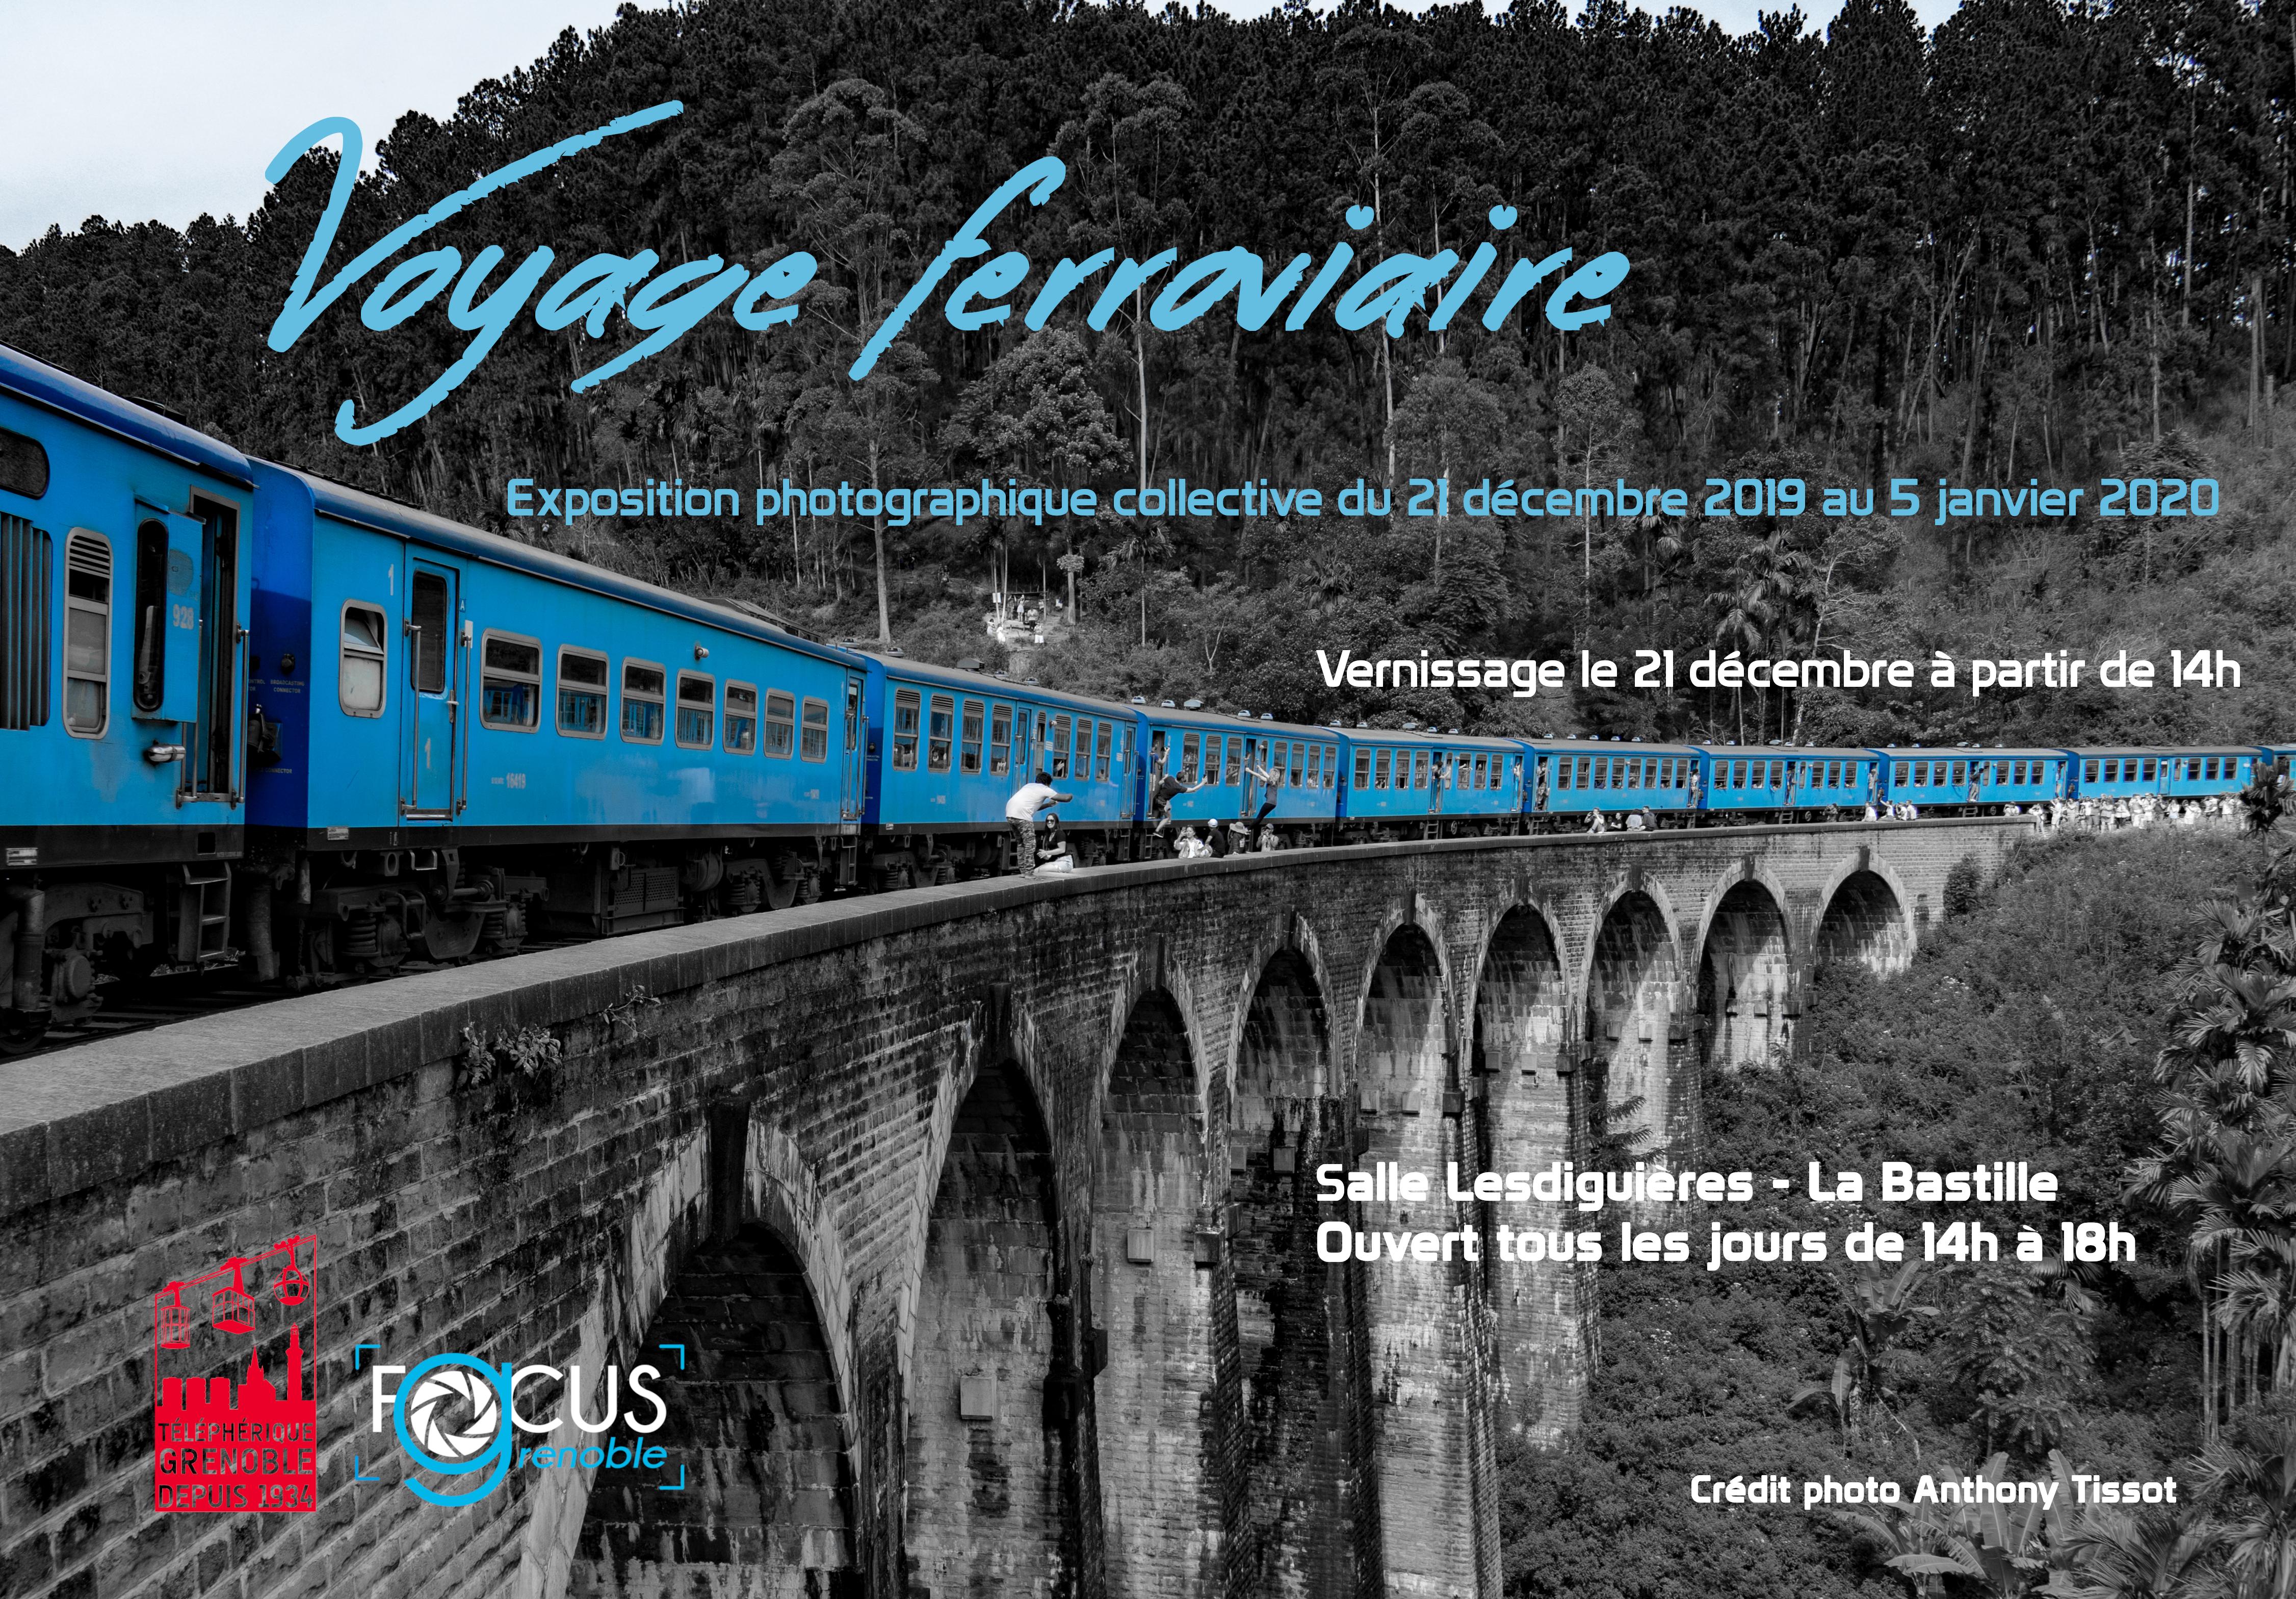 Expo Bastille 2019-2020 «Voyage ferroviaire»